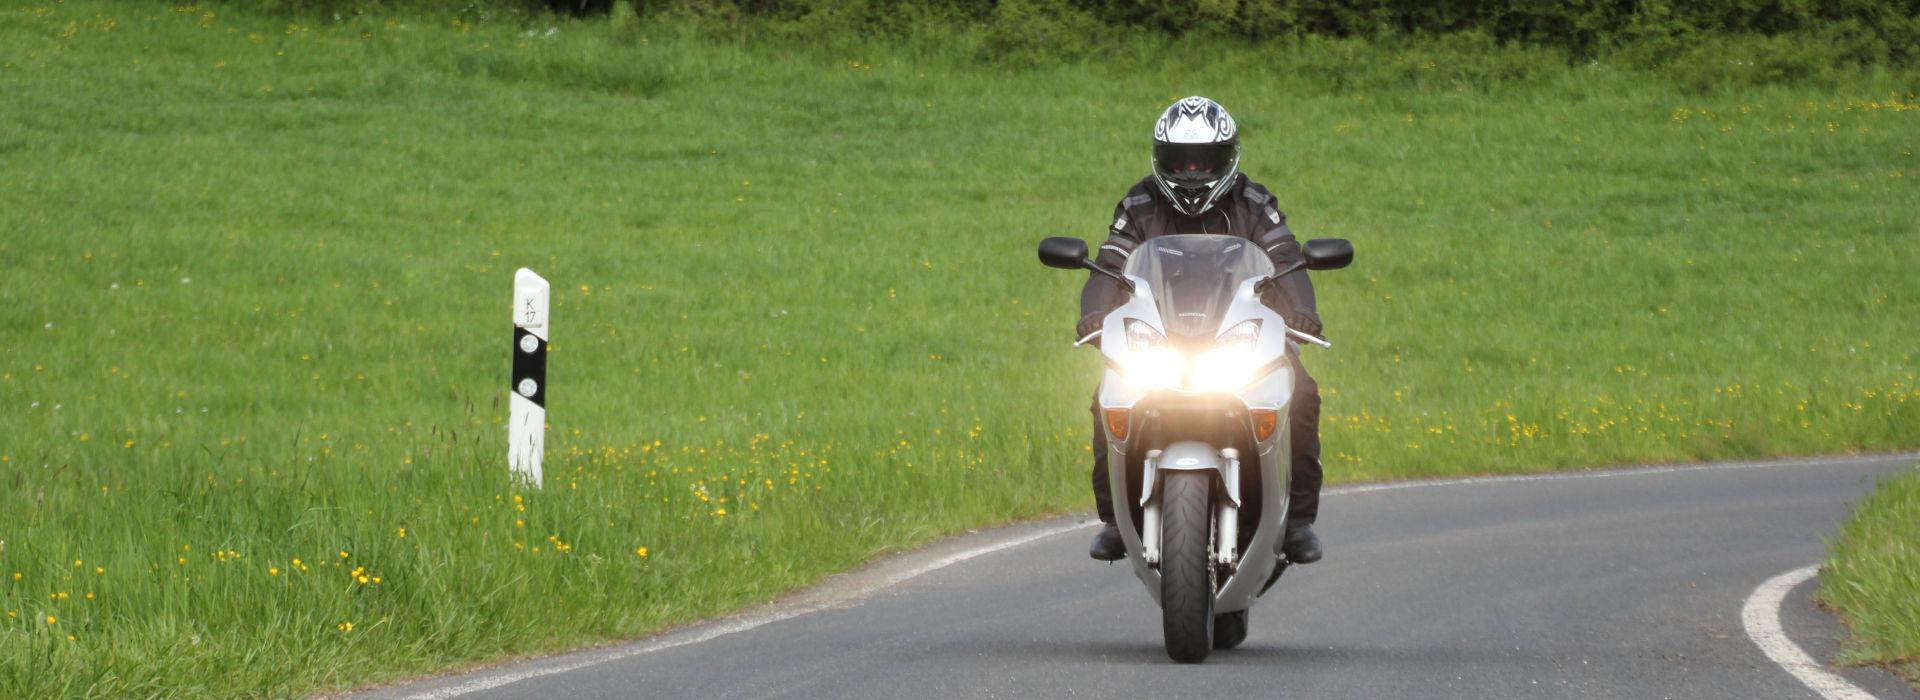 Motorrijbewijspoint Middelburg motorexamens AVB en AVD